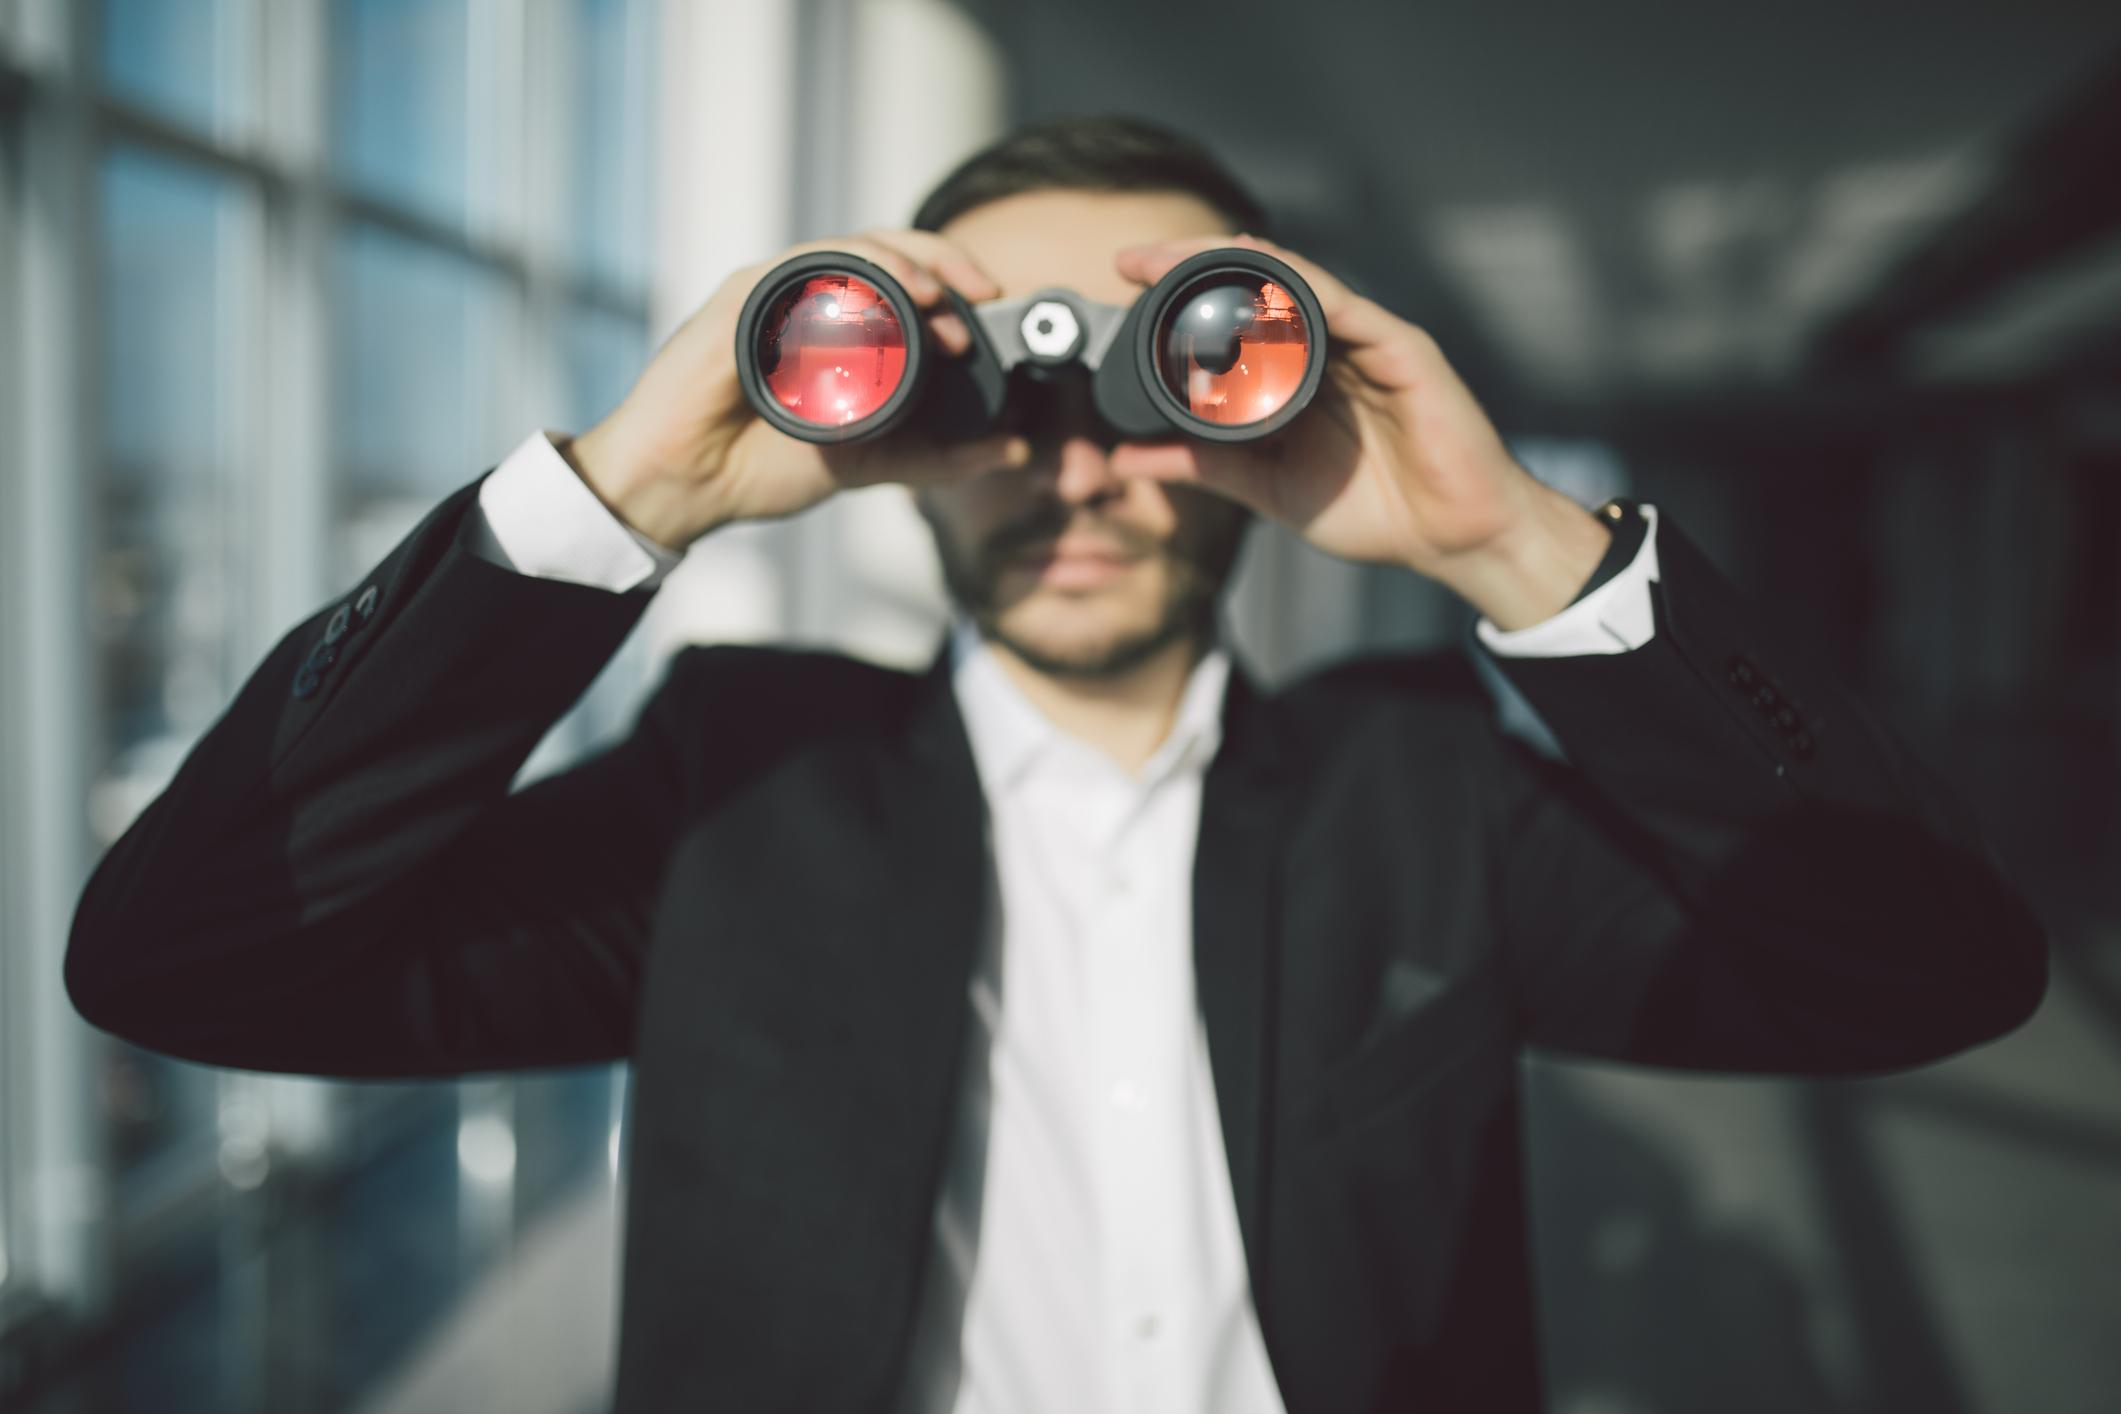 Businessperson looking through binoculars